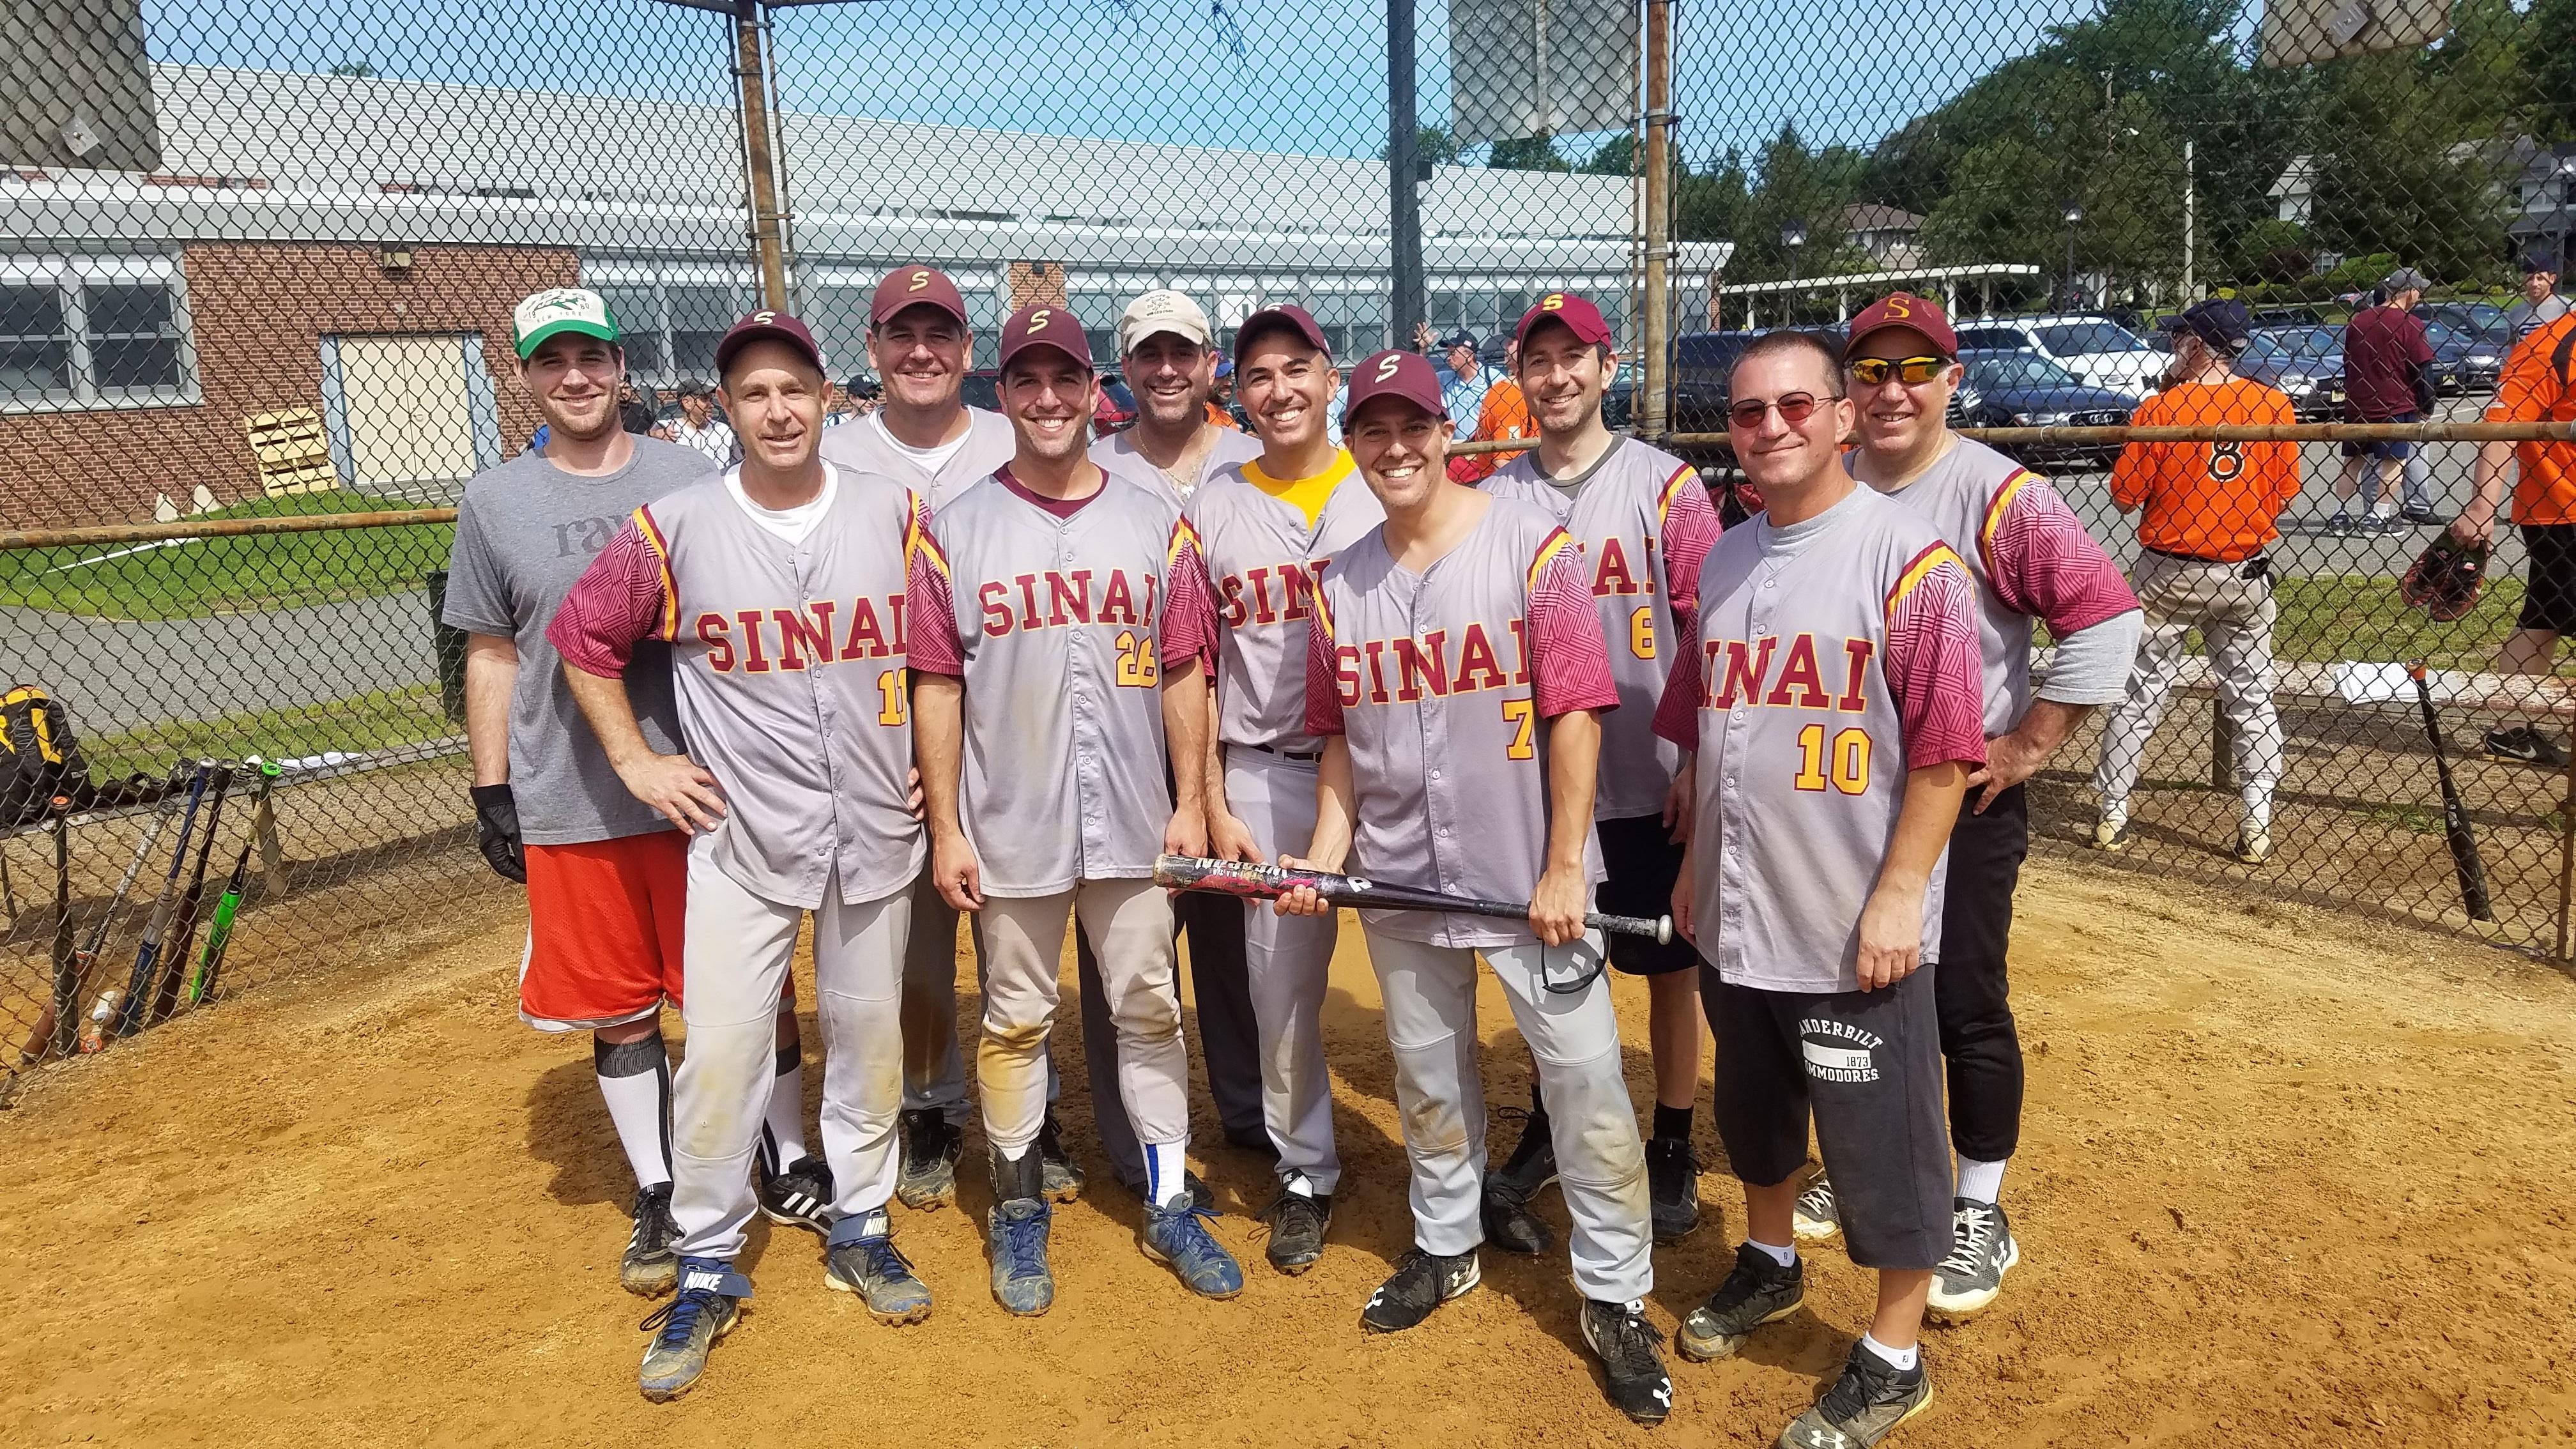 "<span class=""slider_title"">                                     Softball Team                                </span>"